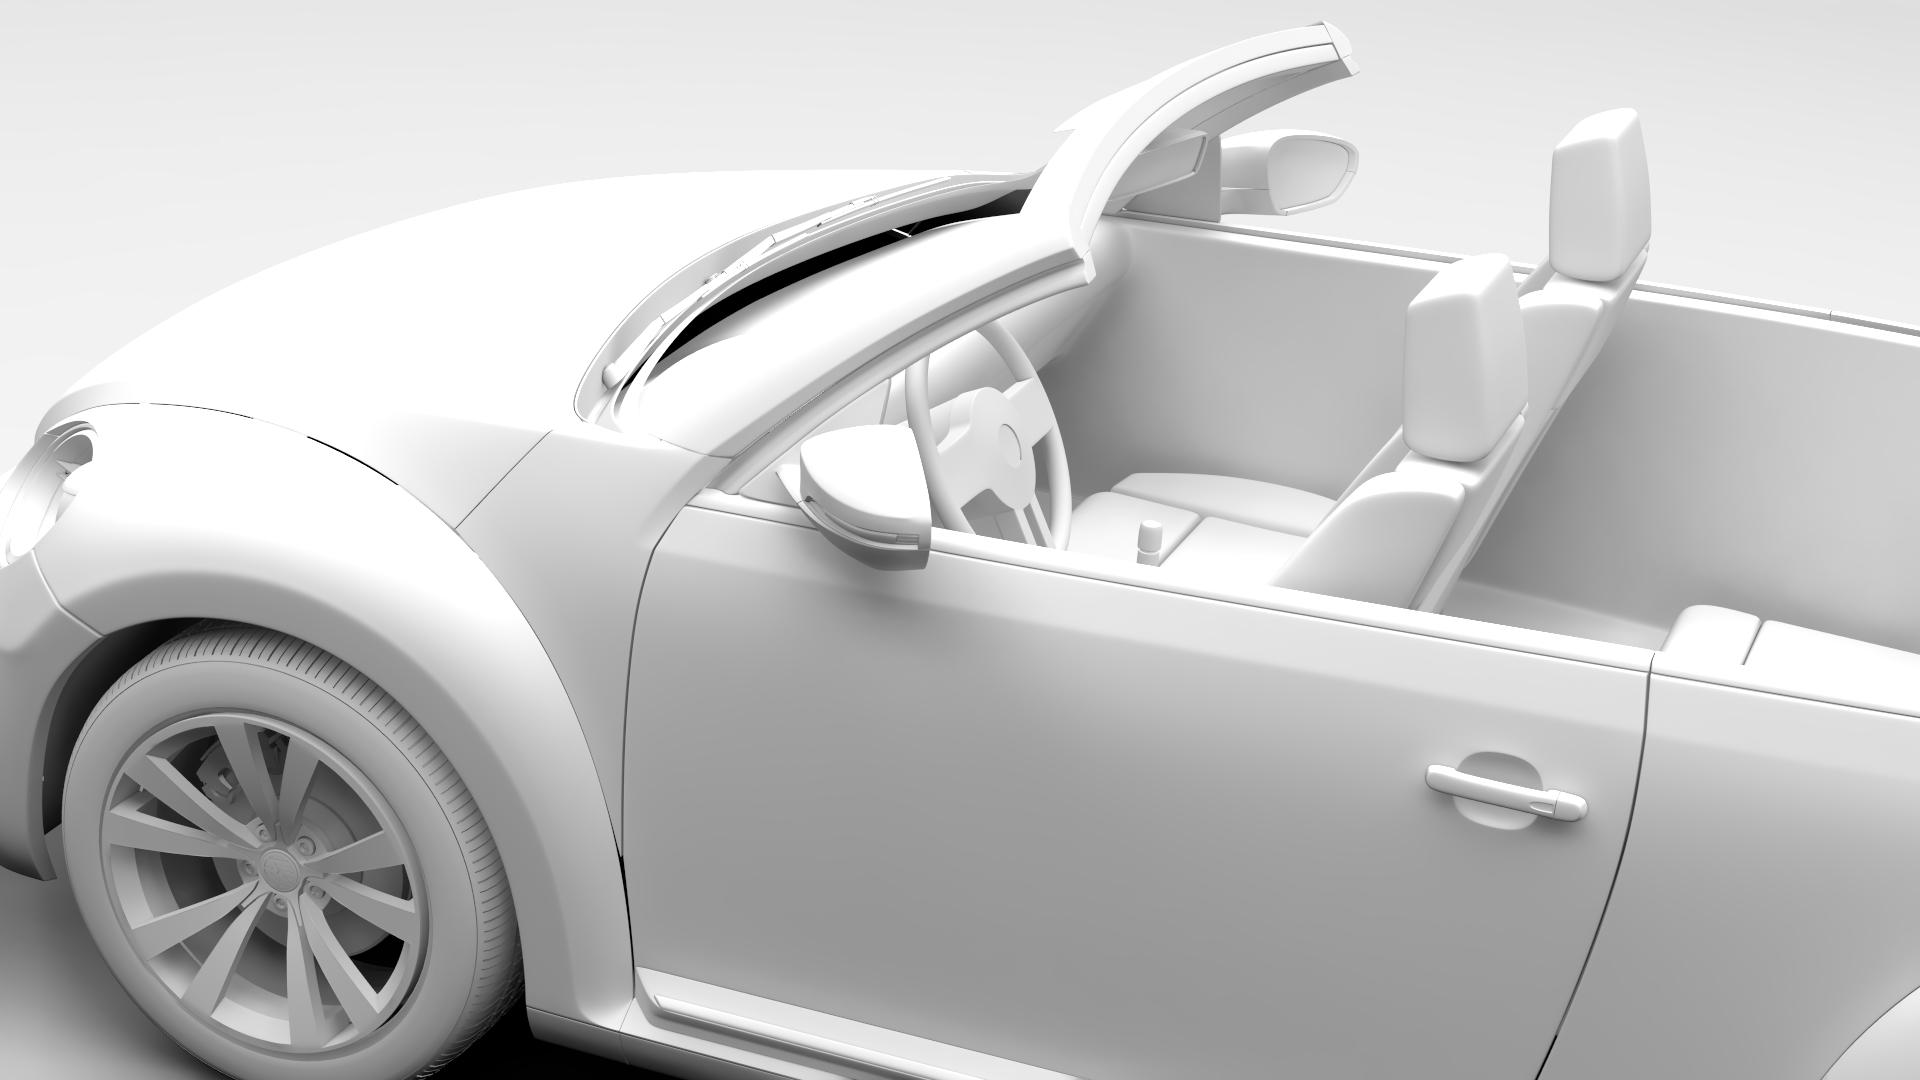 vw beetle cabriolet 2017 3d model 3ds max fbx c4d lwo ma mb hrc xsi obj 221603